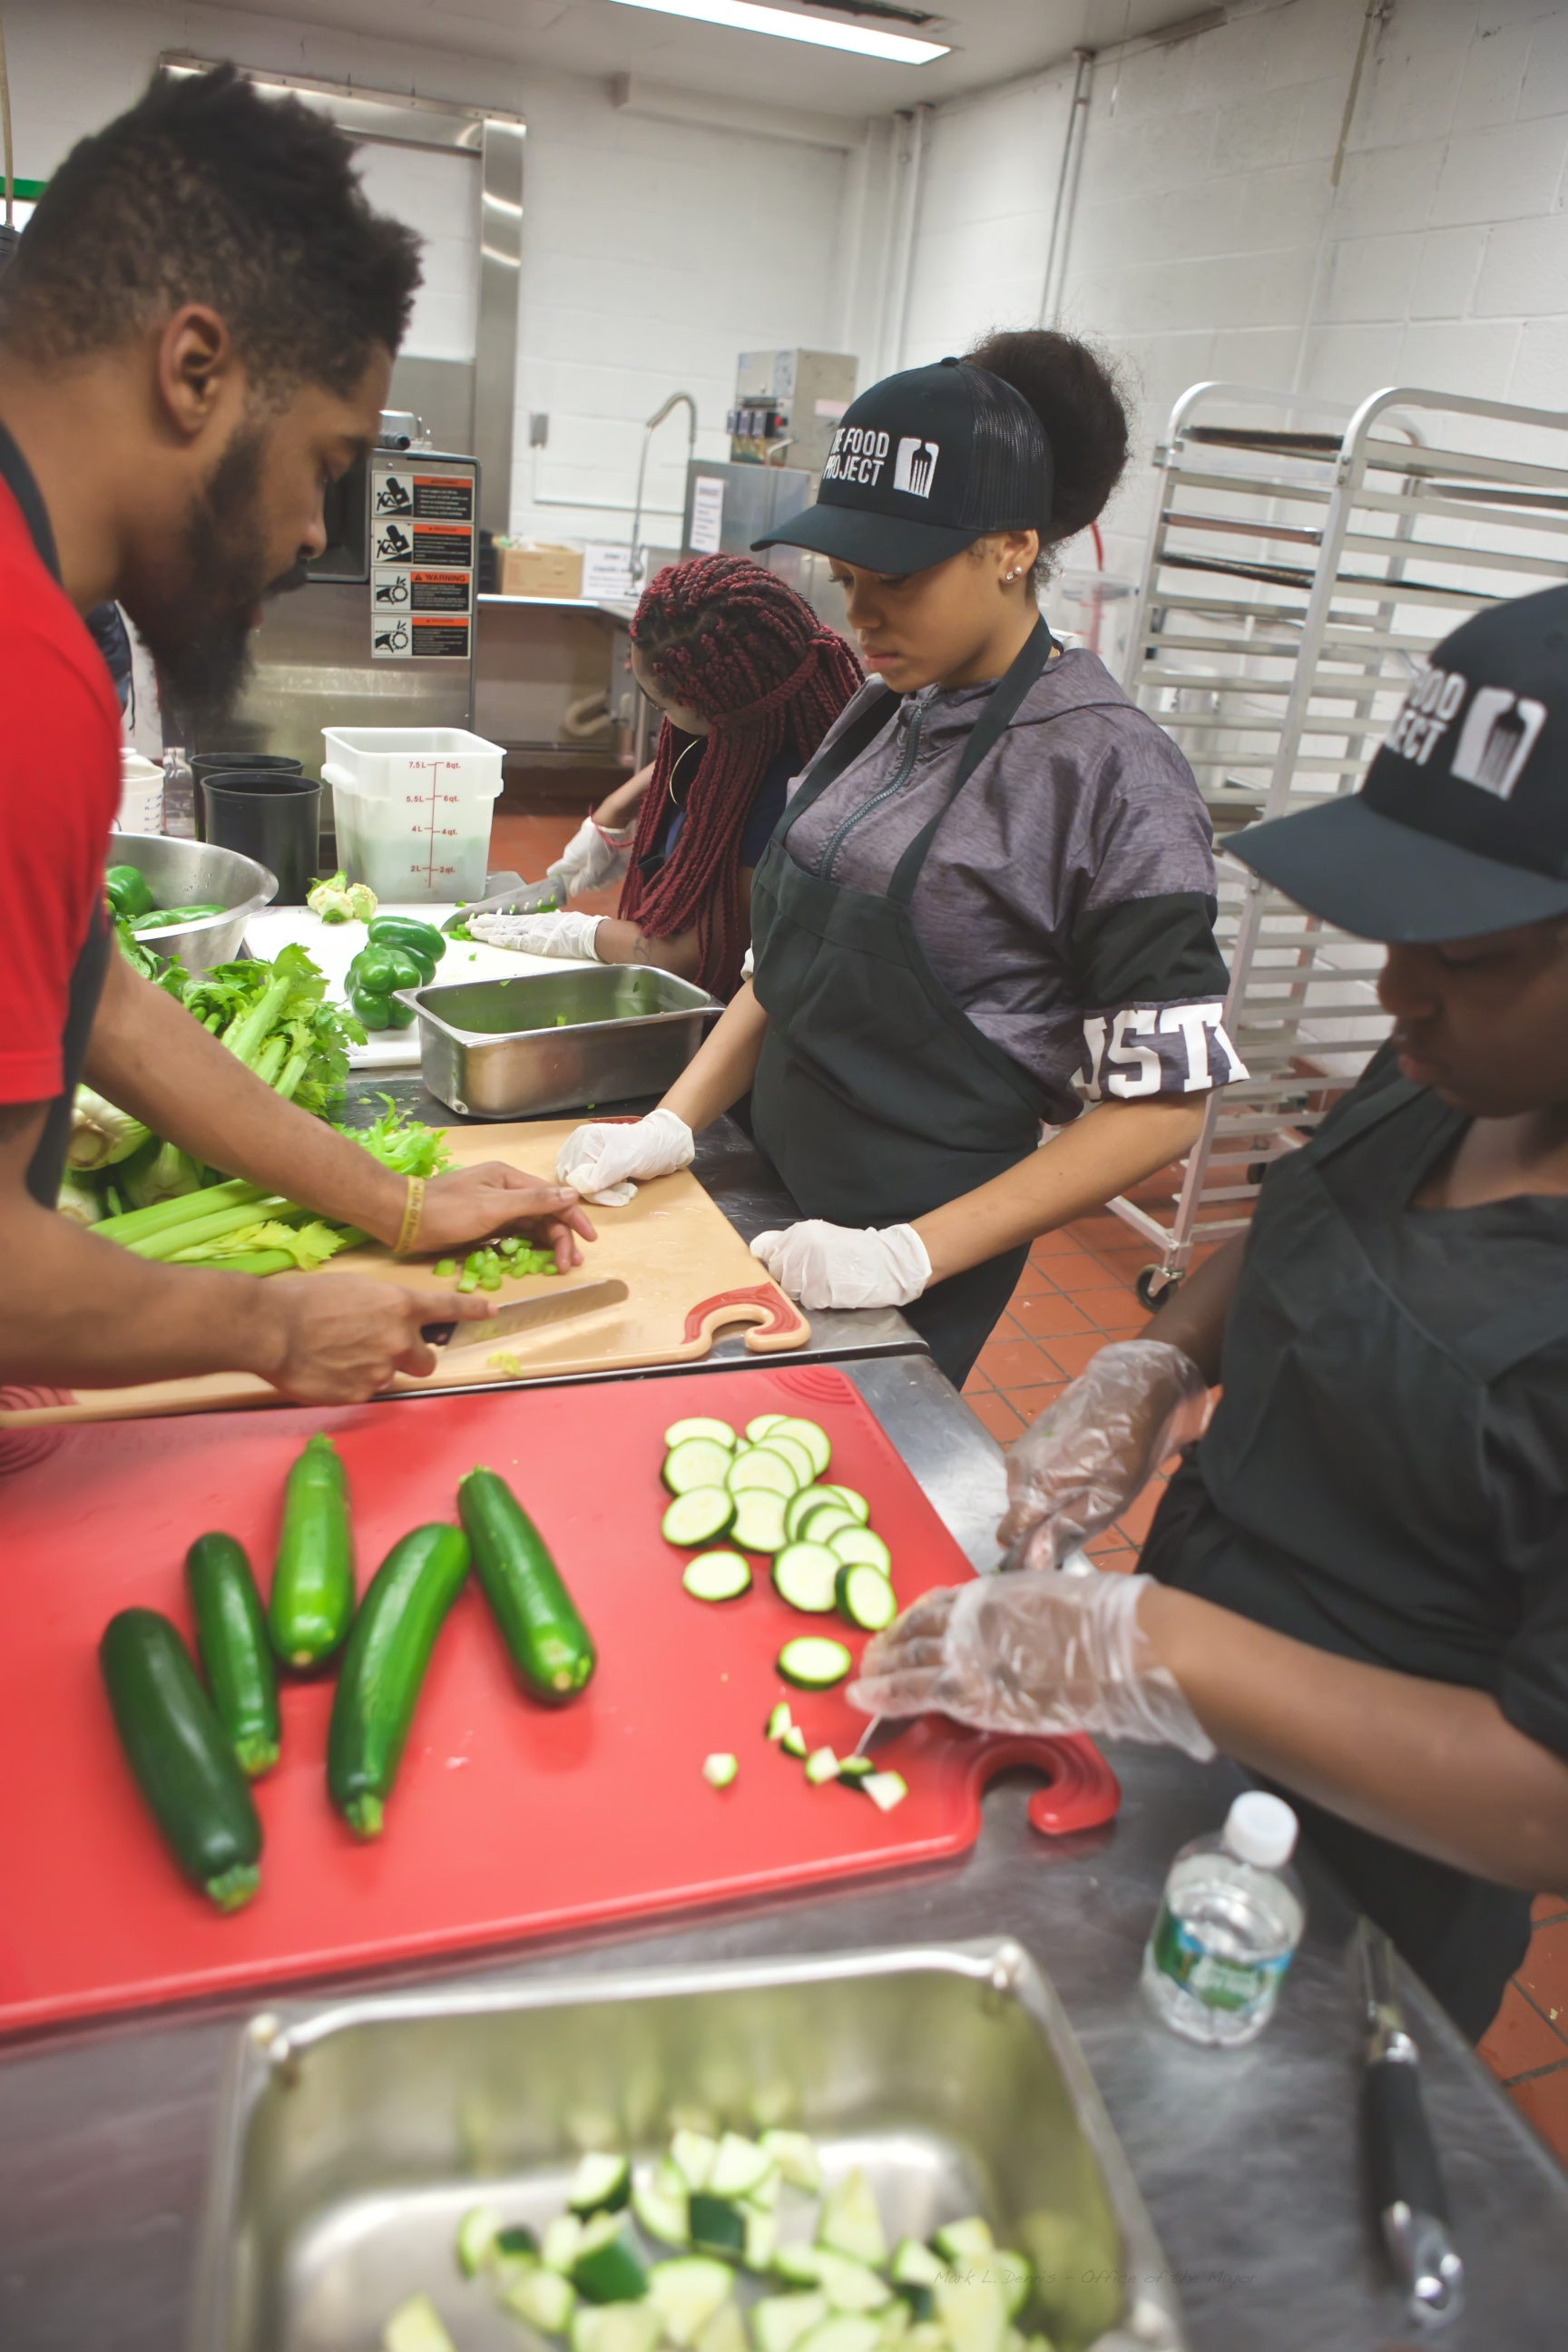 January 26, 2019 - Site visit to The Food Project, 424 S. Pulaski Street 2019-01-26 (9).jpg